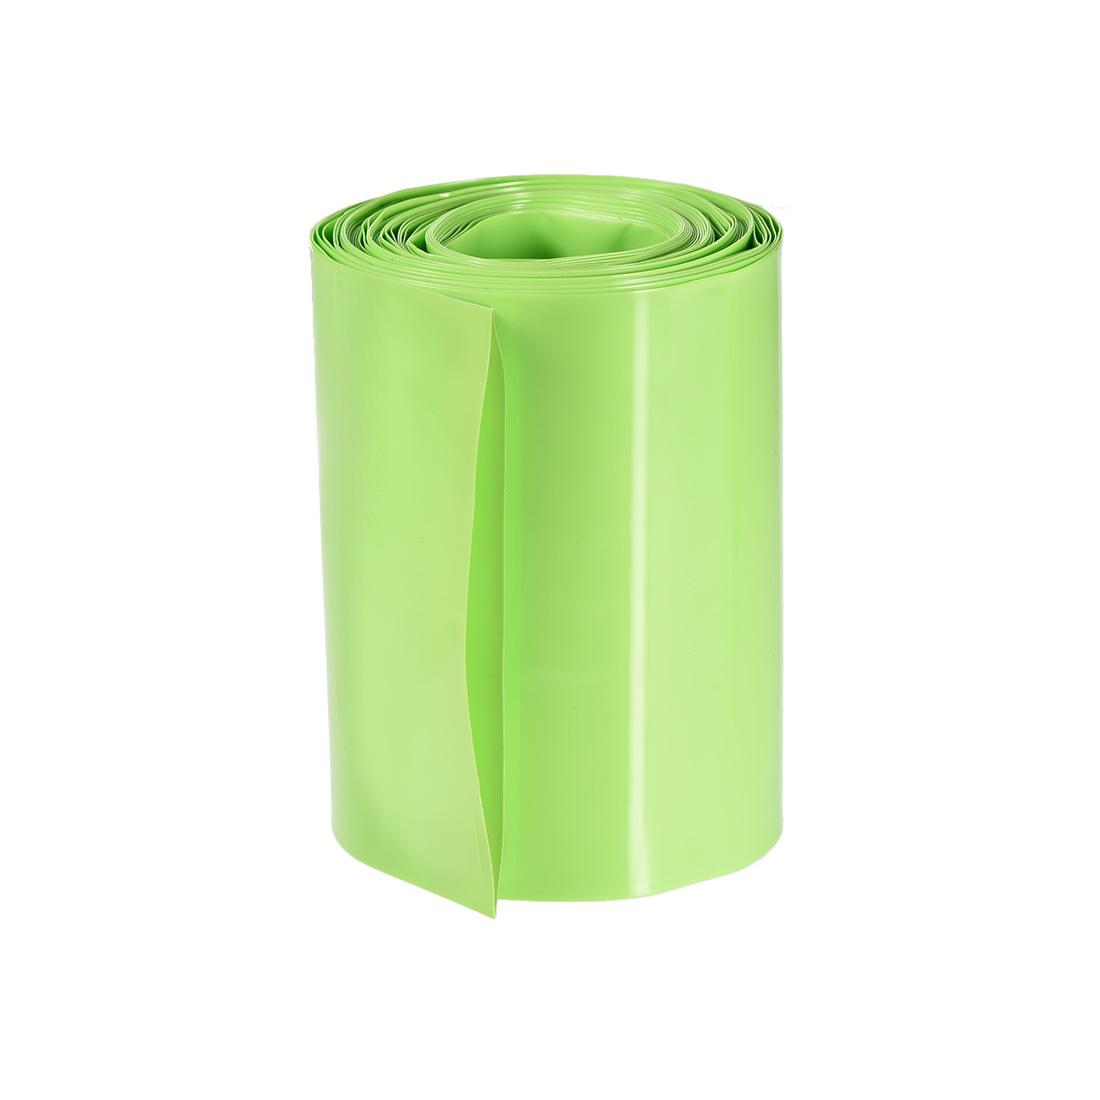 PVC Heat Shrink Tubing 70mm Flat Width Heat Shrink Wrap Tube Green 5M Length